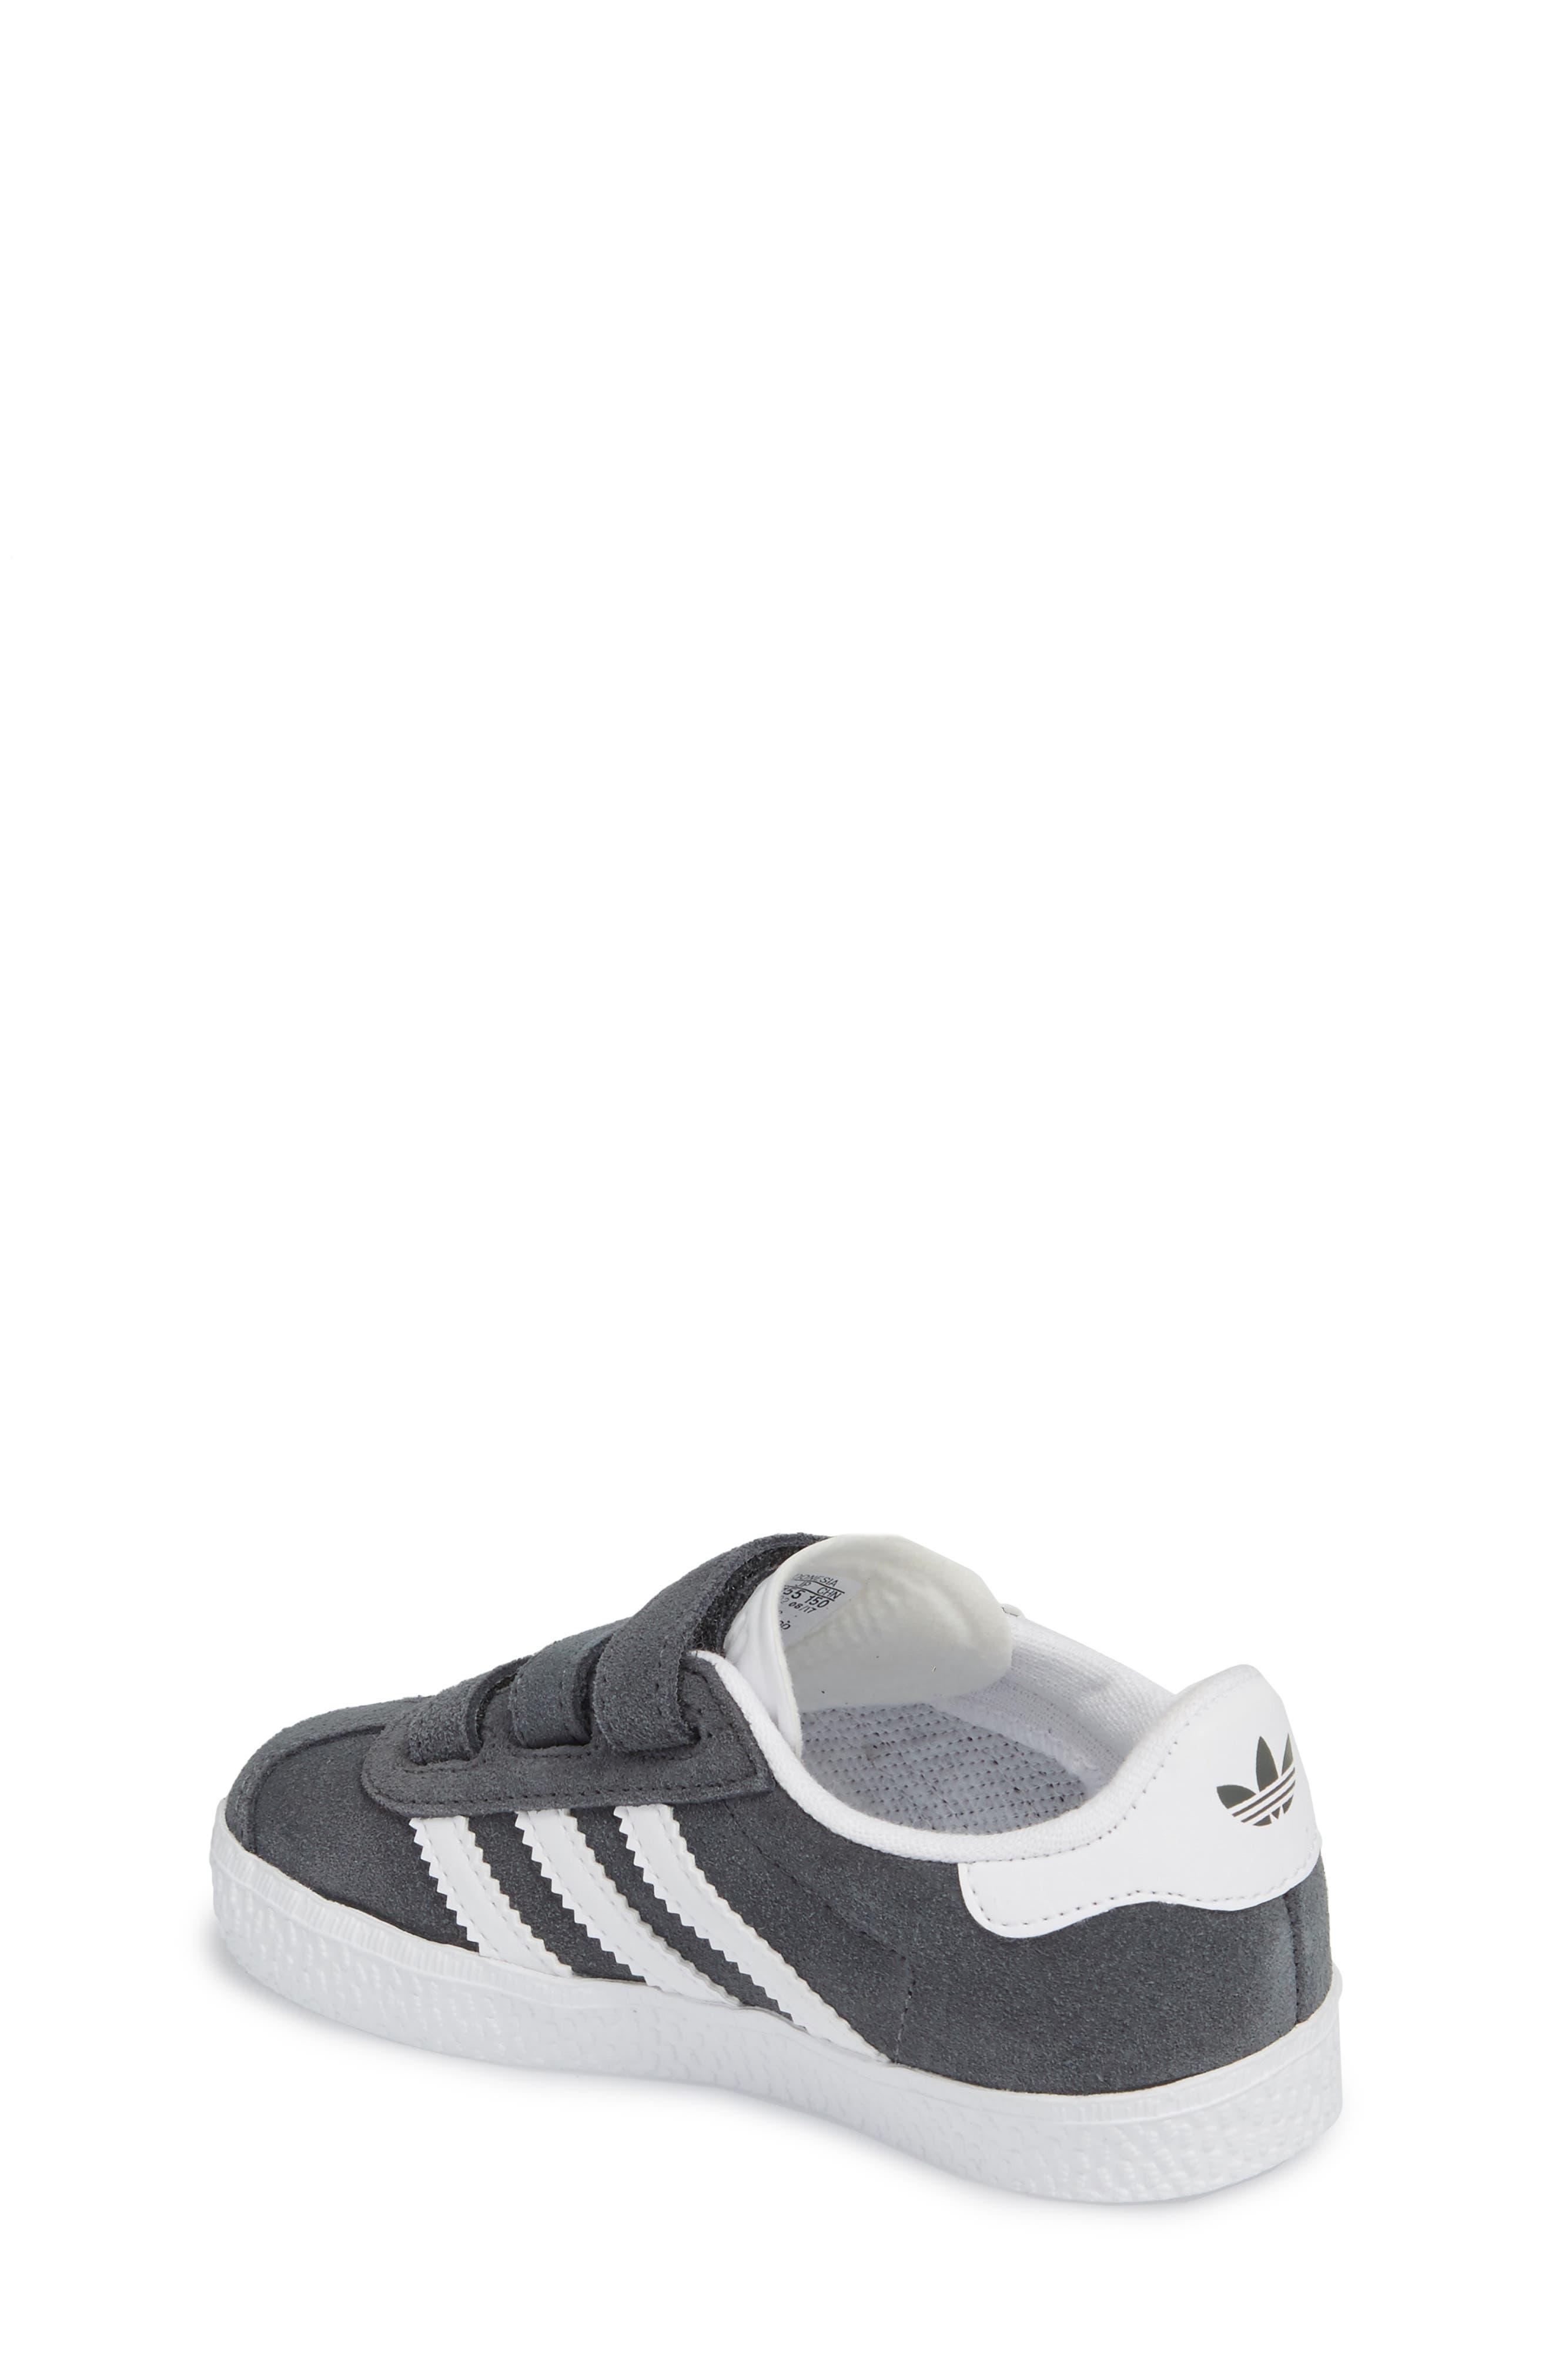 Gazelle Sneaker,                             Alternate thumbnail 2, color,                             SOLID GREY / WHITE / WHITE